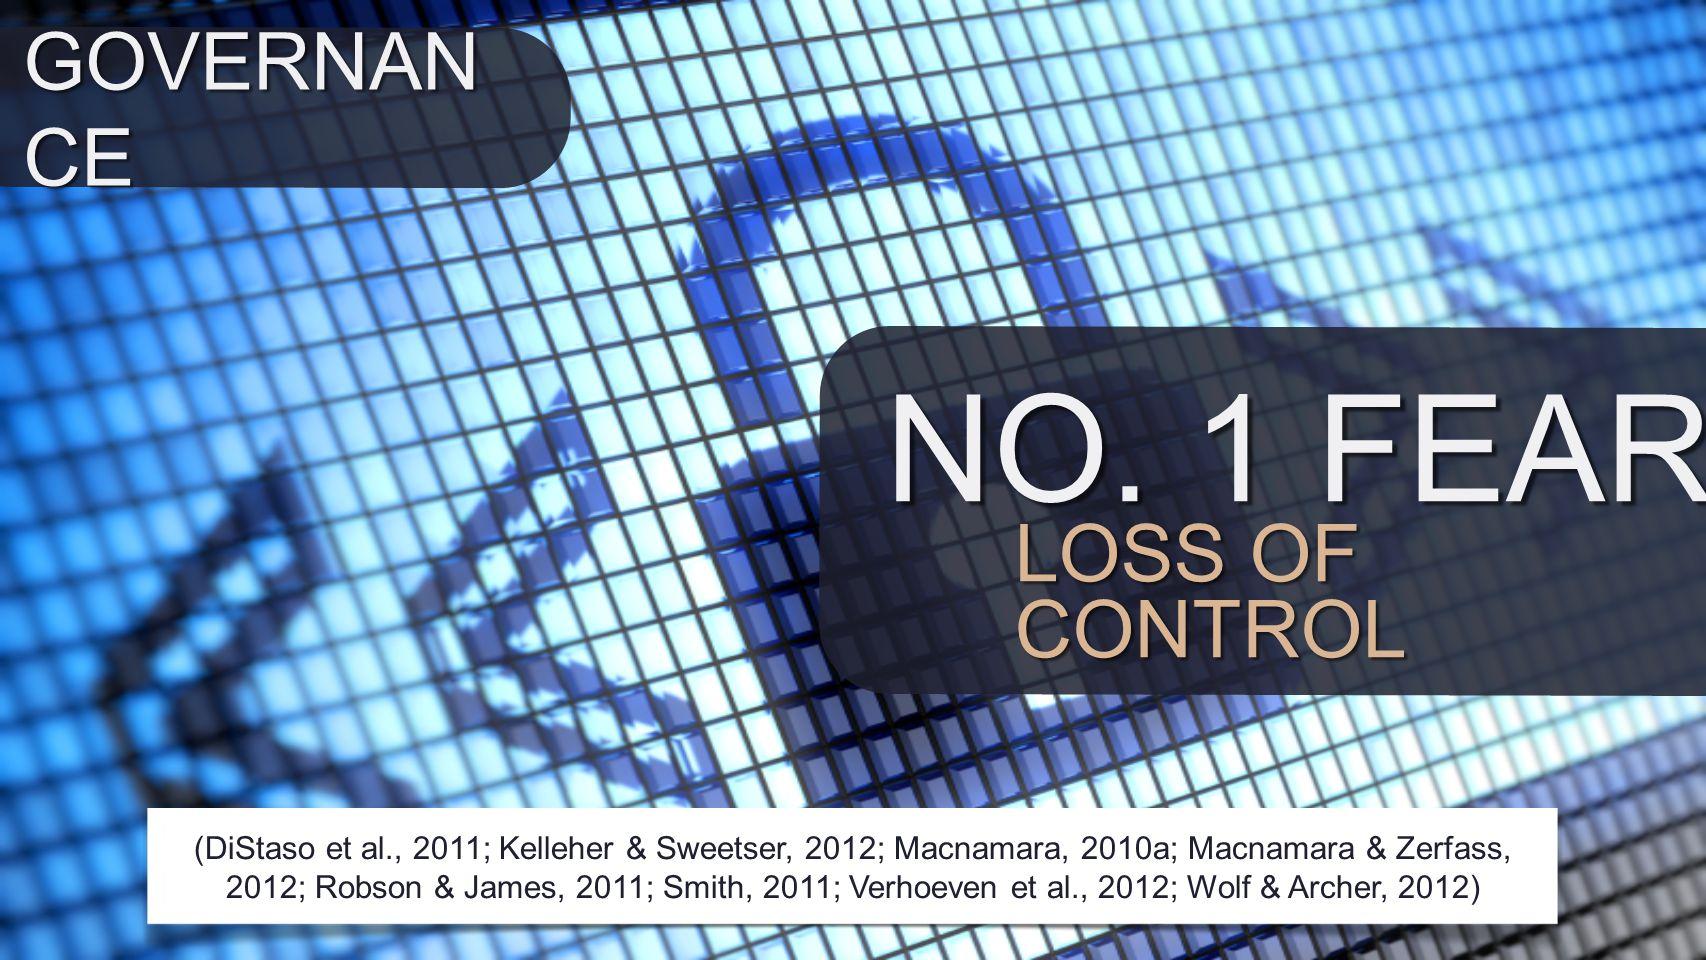 NO. 1 FEAR LOSS OF CONTROL (DiStaso et al., 2011; Kelleher & Sweetser, 2012; Macnamara, 2010a; Macnamara & Zerfass, 2012; Robson & James, 2011; Smith,